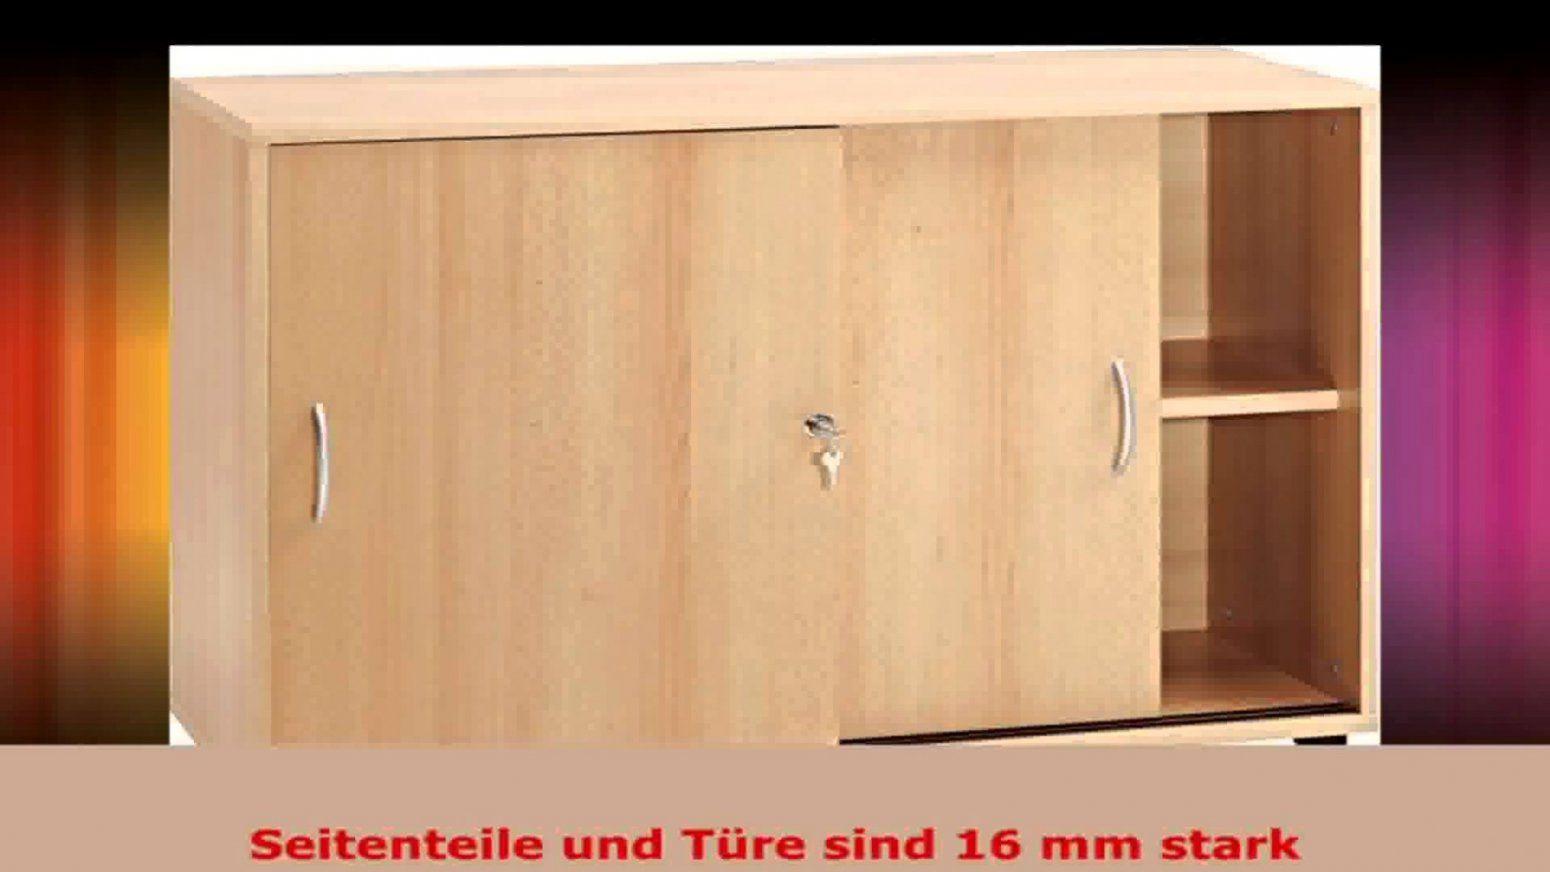 schrank bauen anleitung amazing tv schrank selber bauen neu hifi mbel selber bauen with schrank. Black Bedroom Furniture Sets. Home Design Ideas